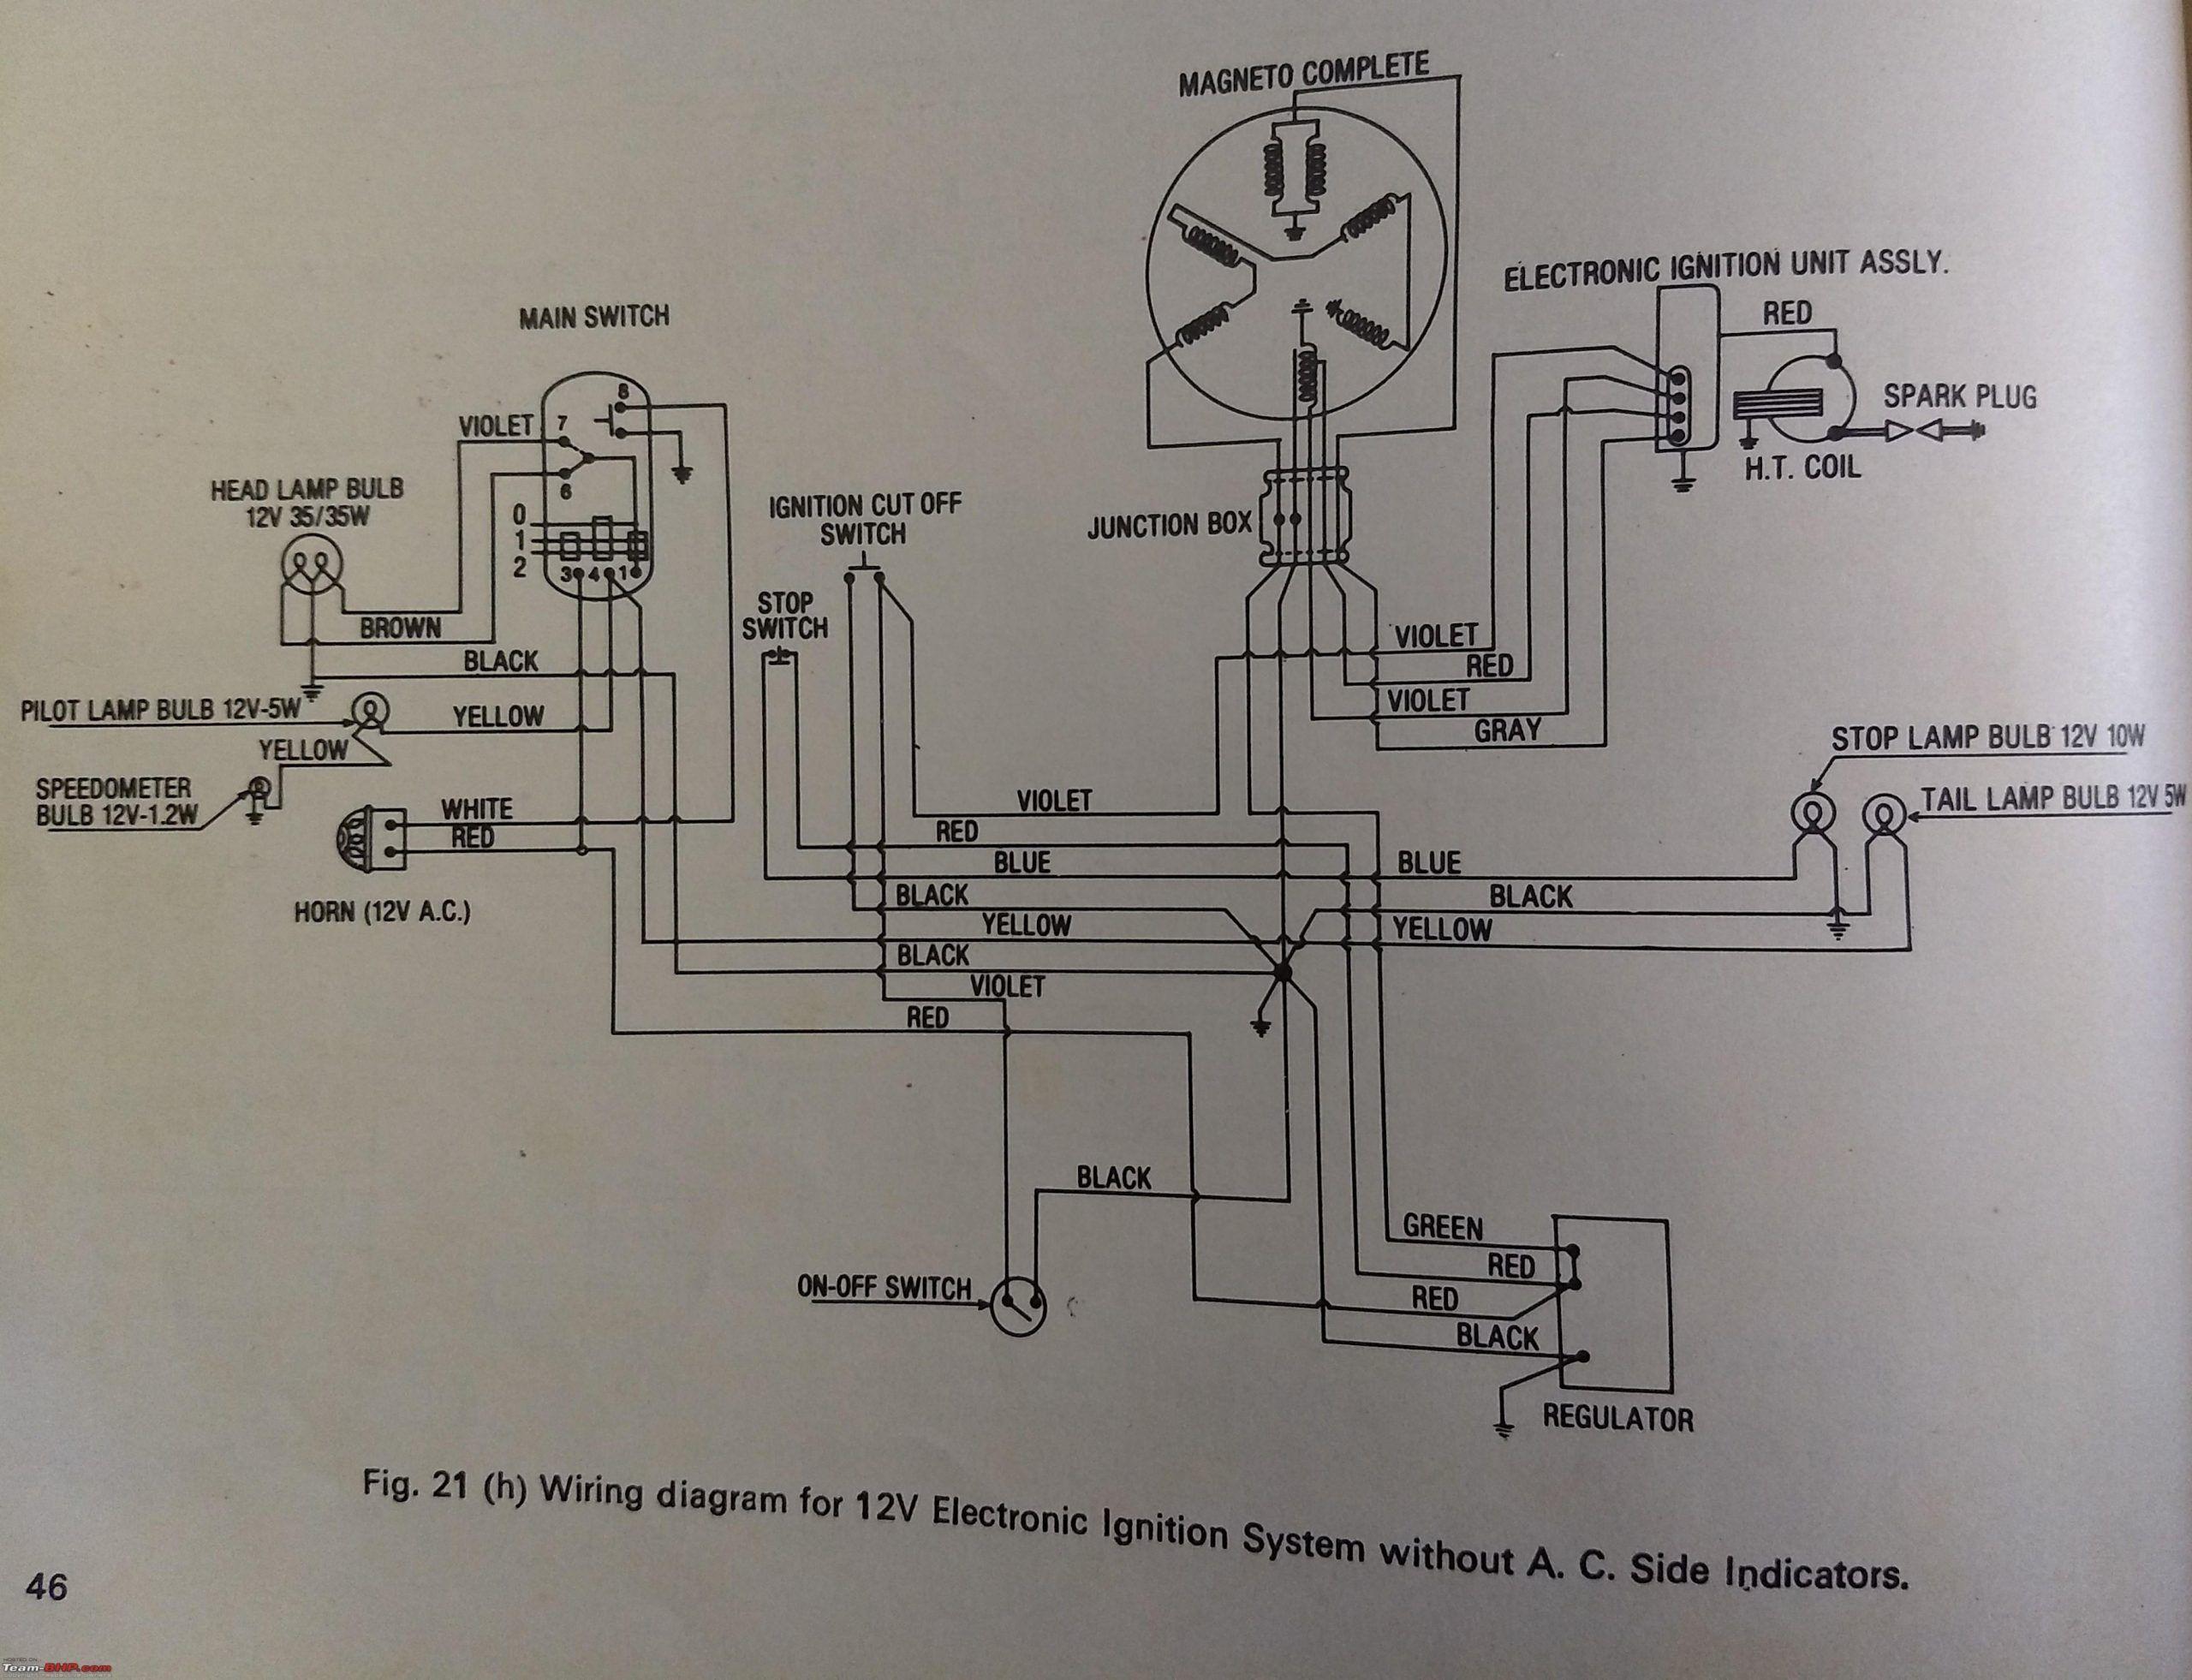 Hero Honda Glamour Engine Diagram Electrical Diagram Electrical Wiring Diagram Diagram